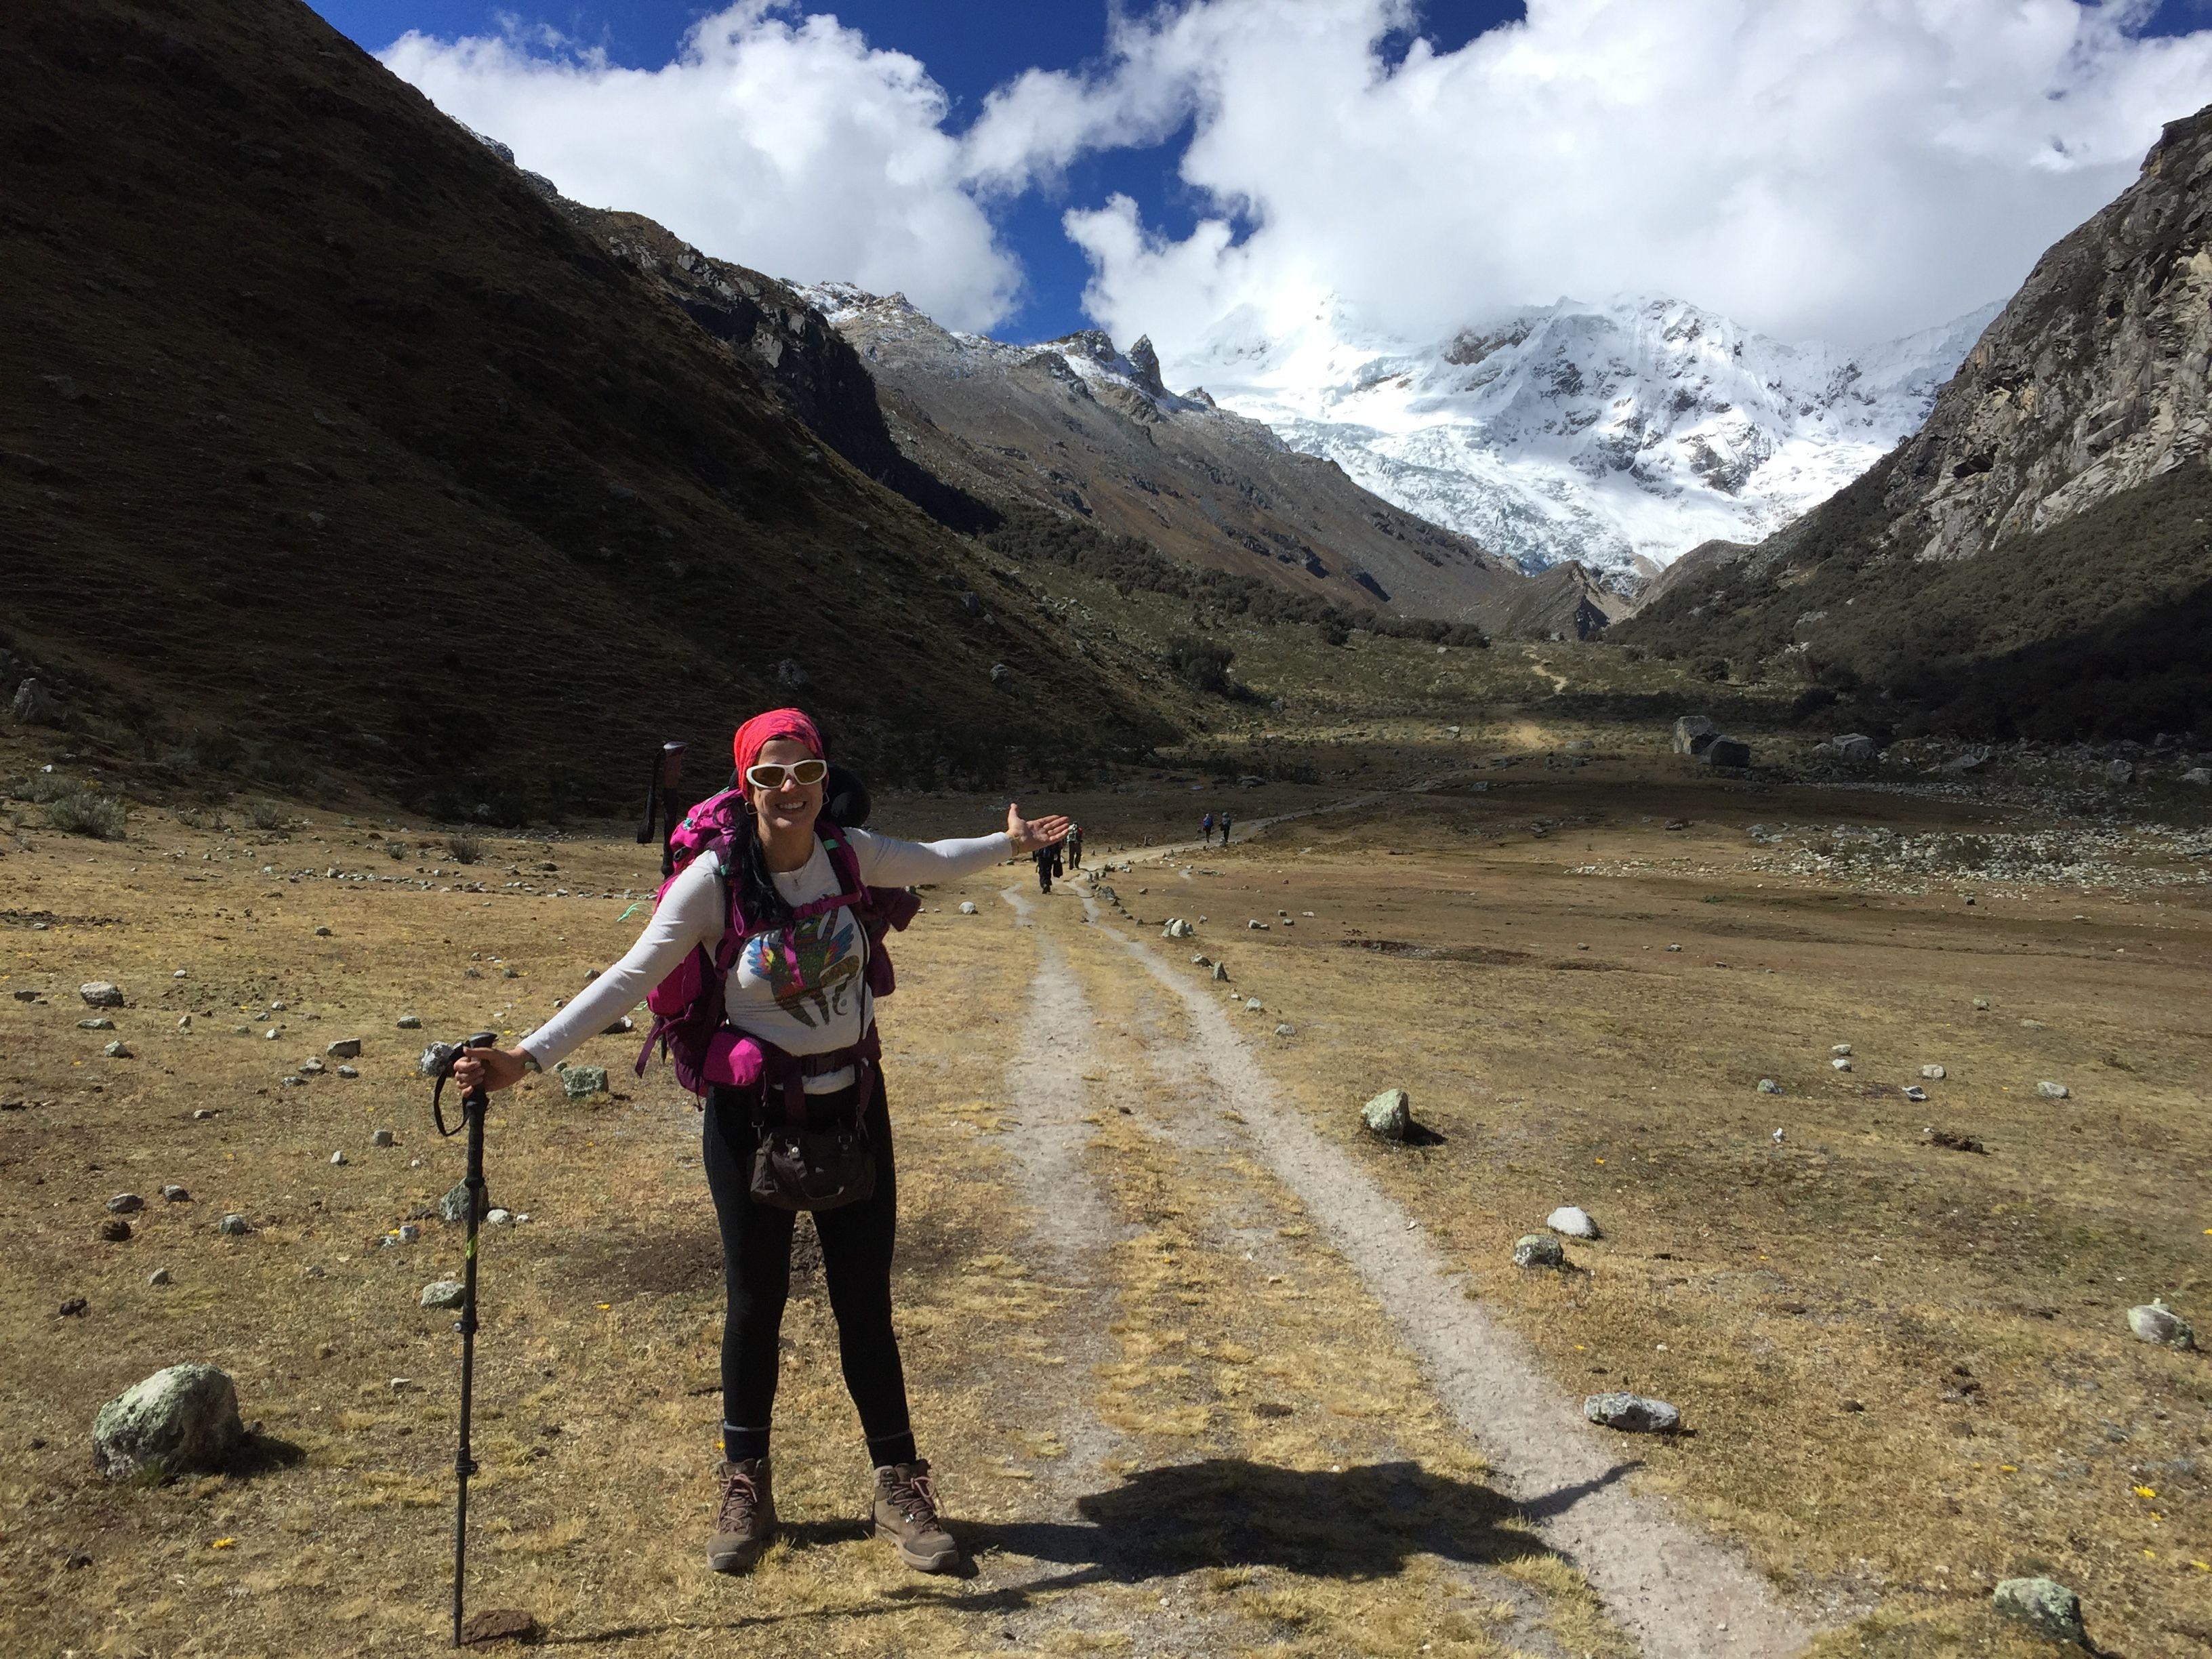 Julio 2018. Cordillera Blanca, Huaraz, Perú.